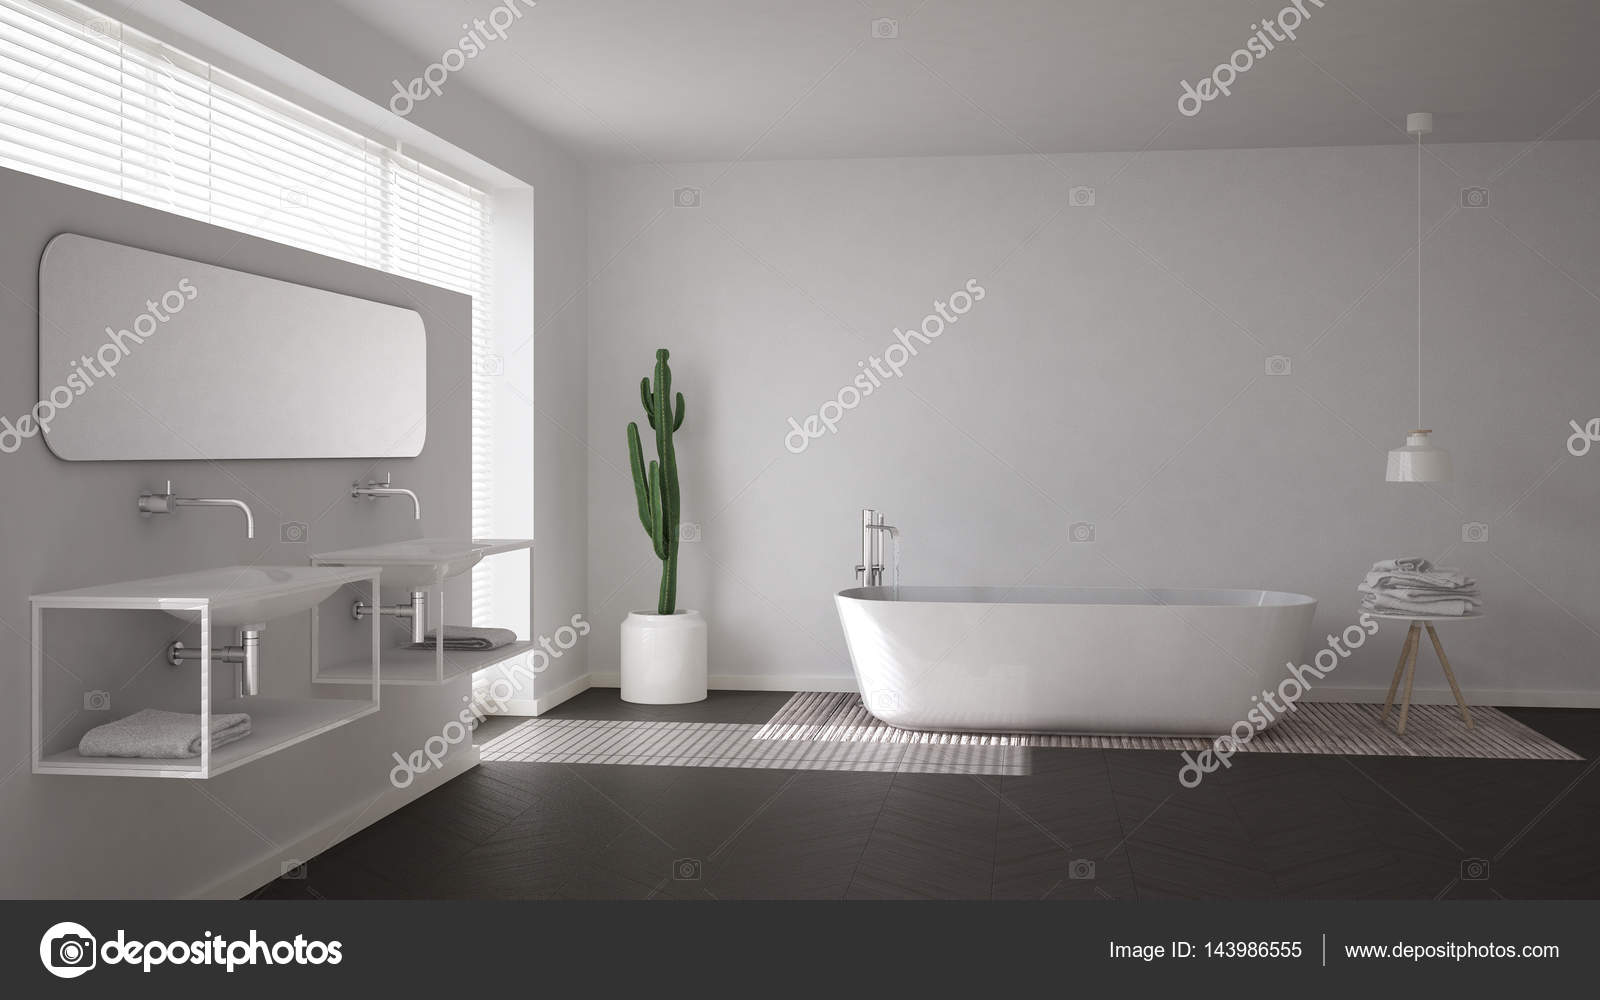 Bagno Design Scandinavo : Bagno scandinavo bianco minimalista interior design u2014 foto stock